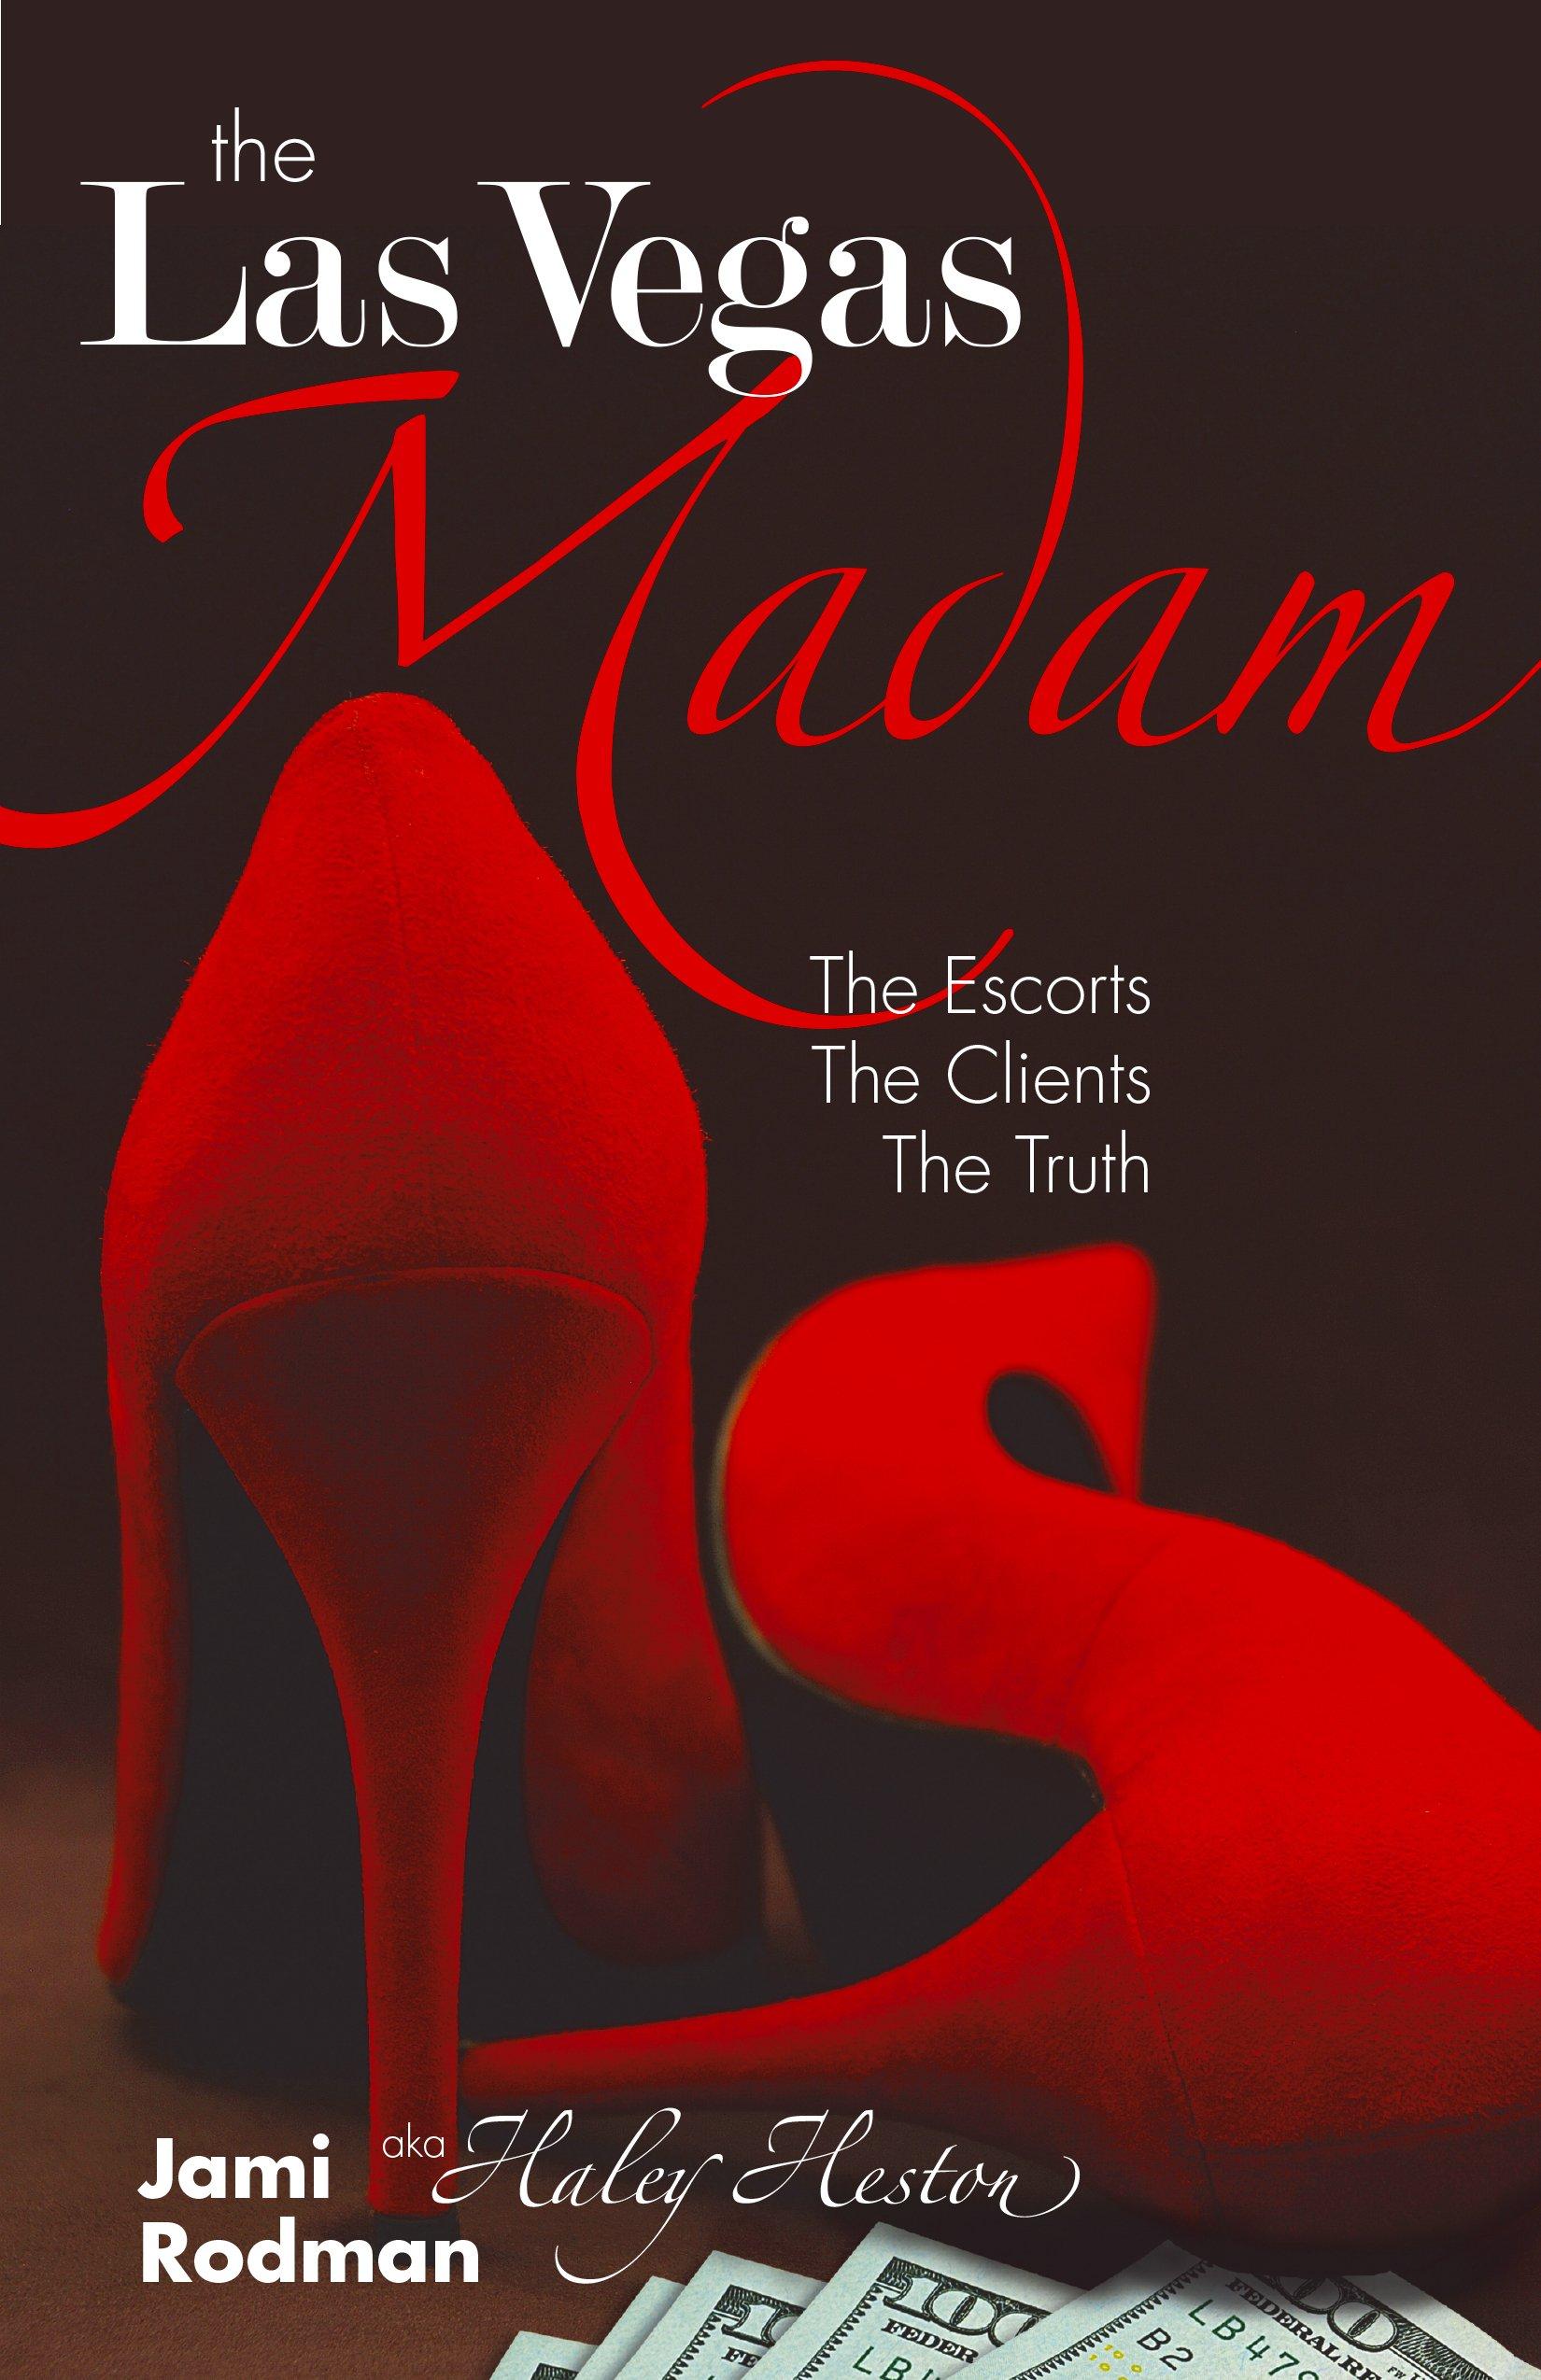 The Las Vegas Madam The Escorts The Clients The Truth Jami Rodman 9780996568203 Amazon Com Books